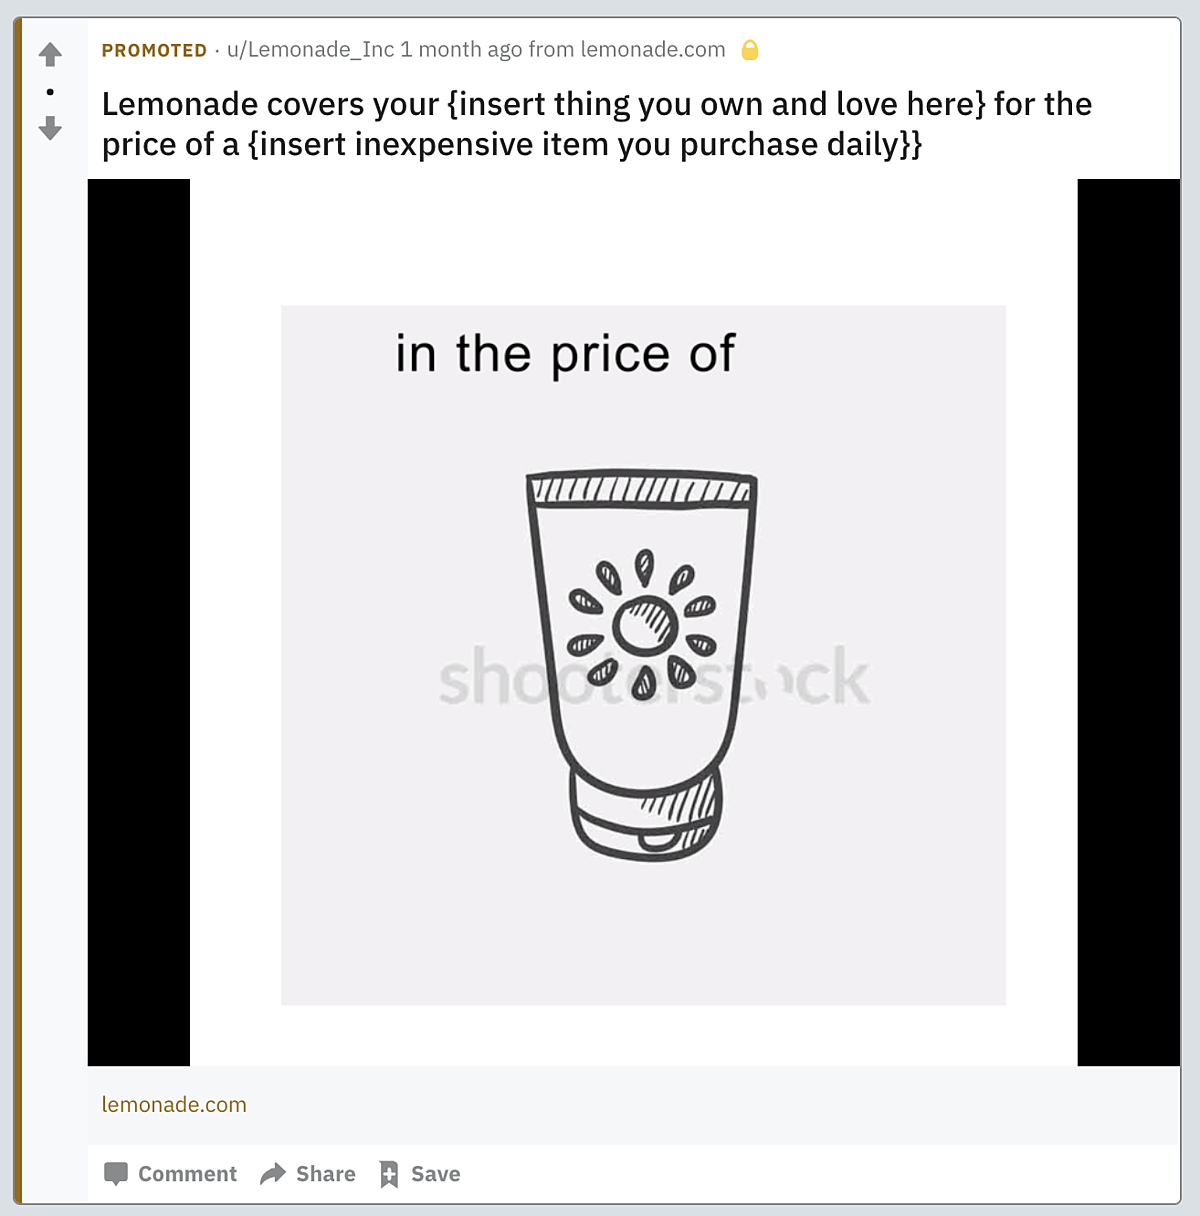 How 10 Brands Use Reddit for Marketing